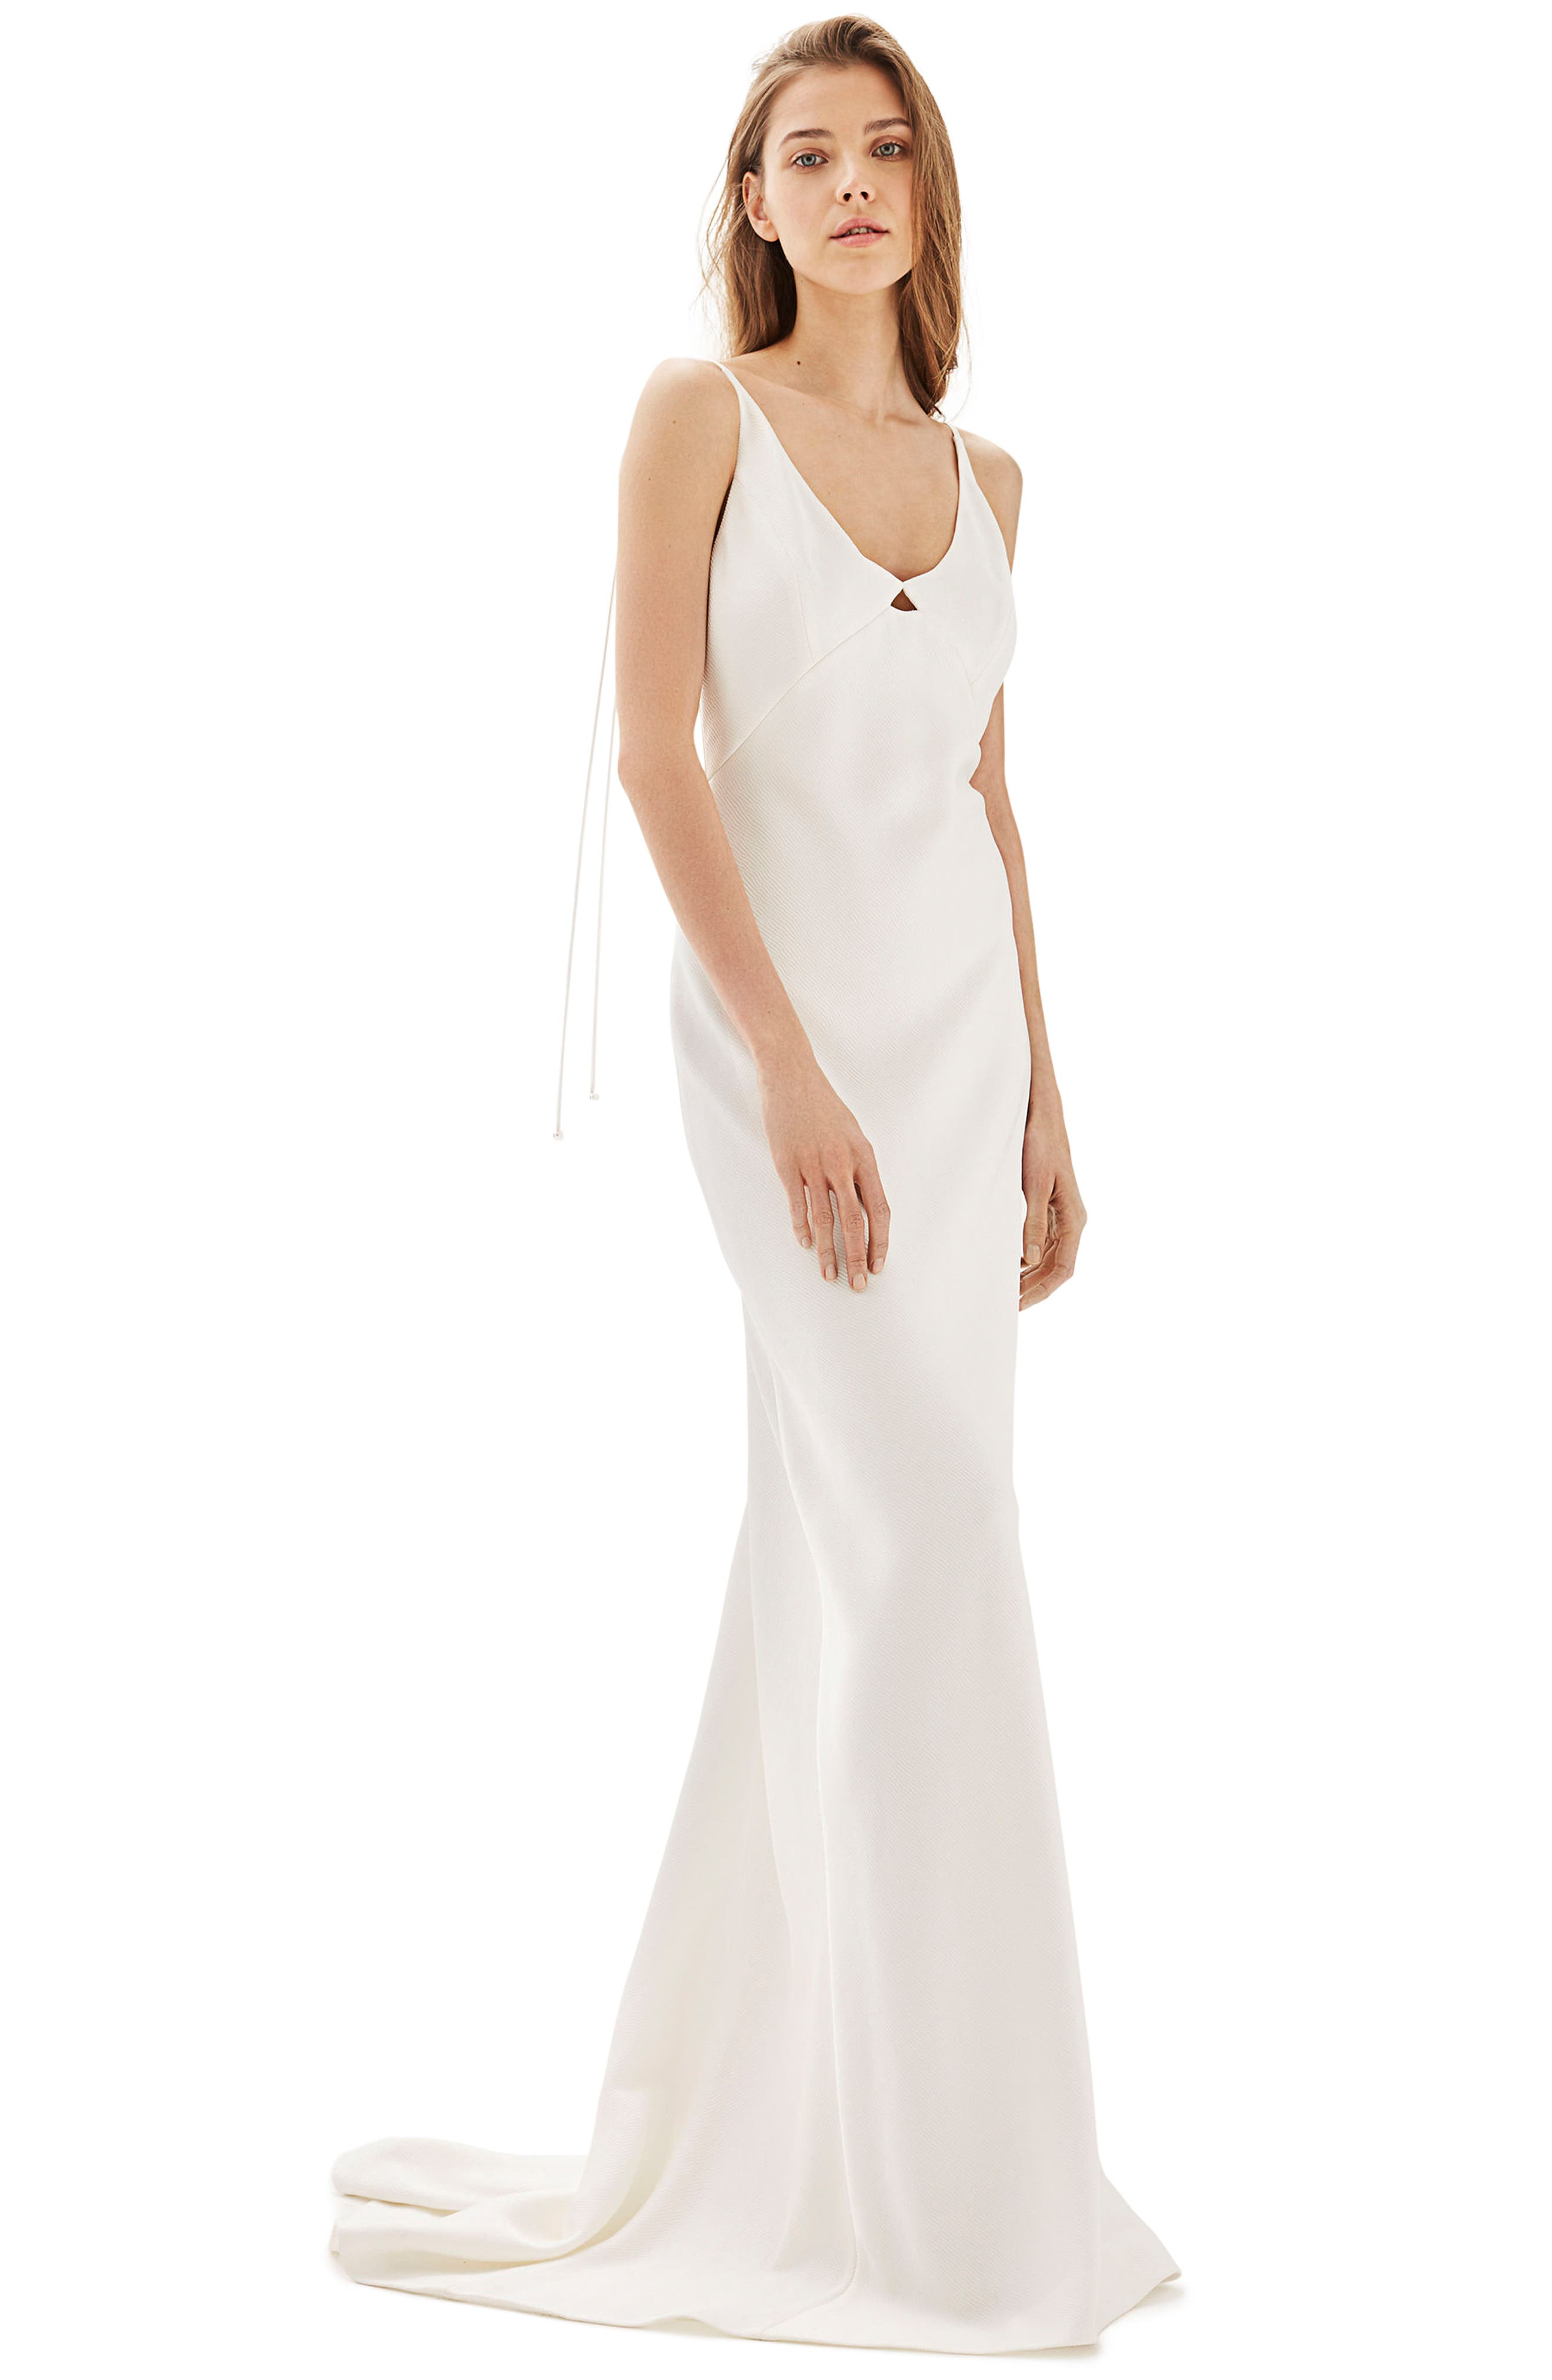 Bride V-Neck Satin Sheath Gown,                         Main,                         color, 900